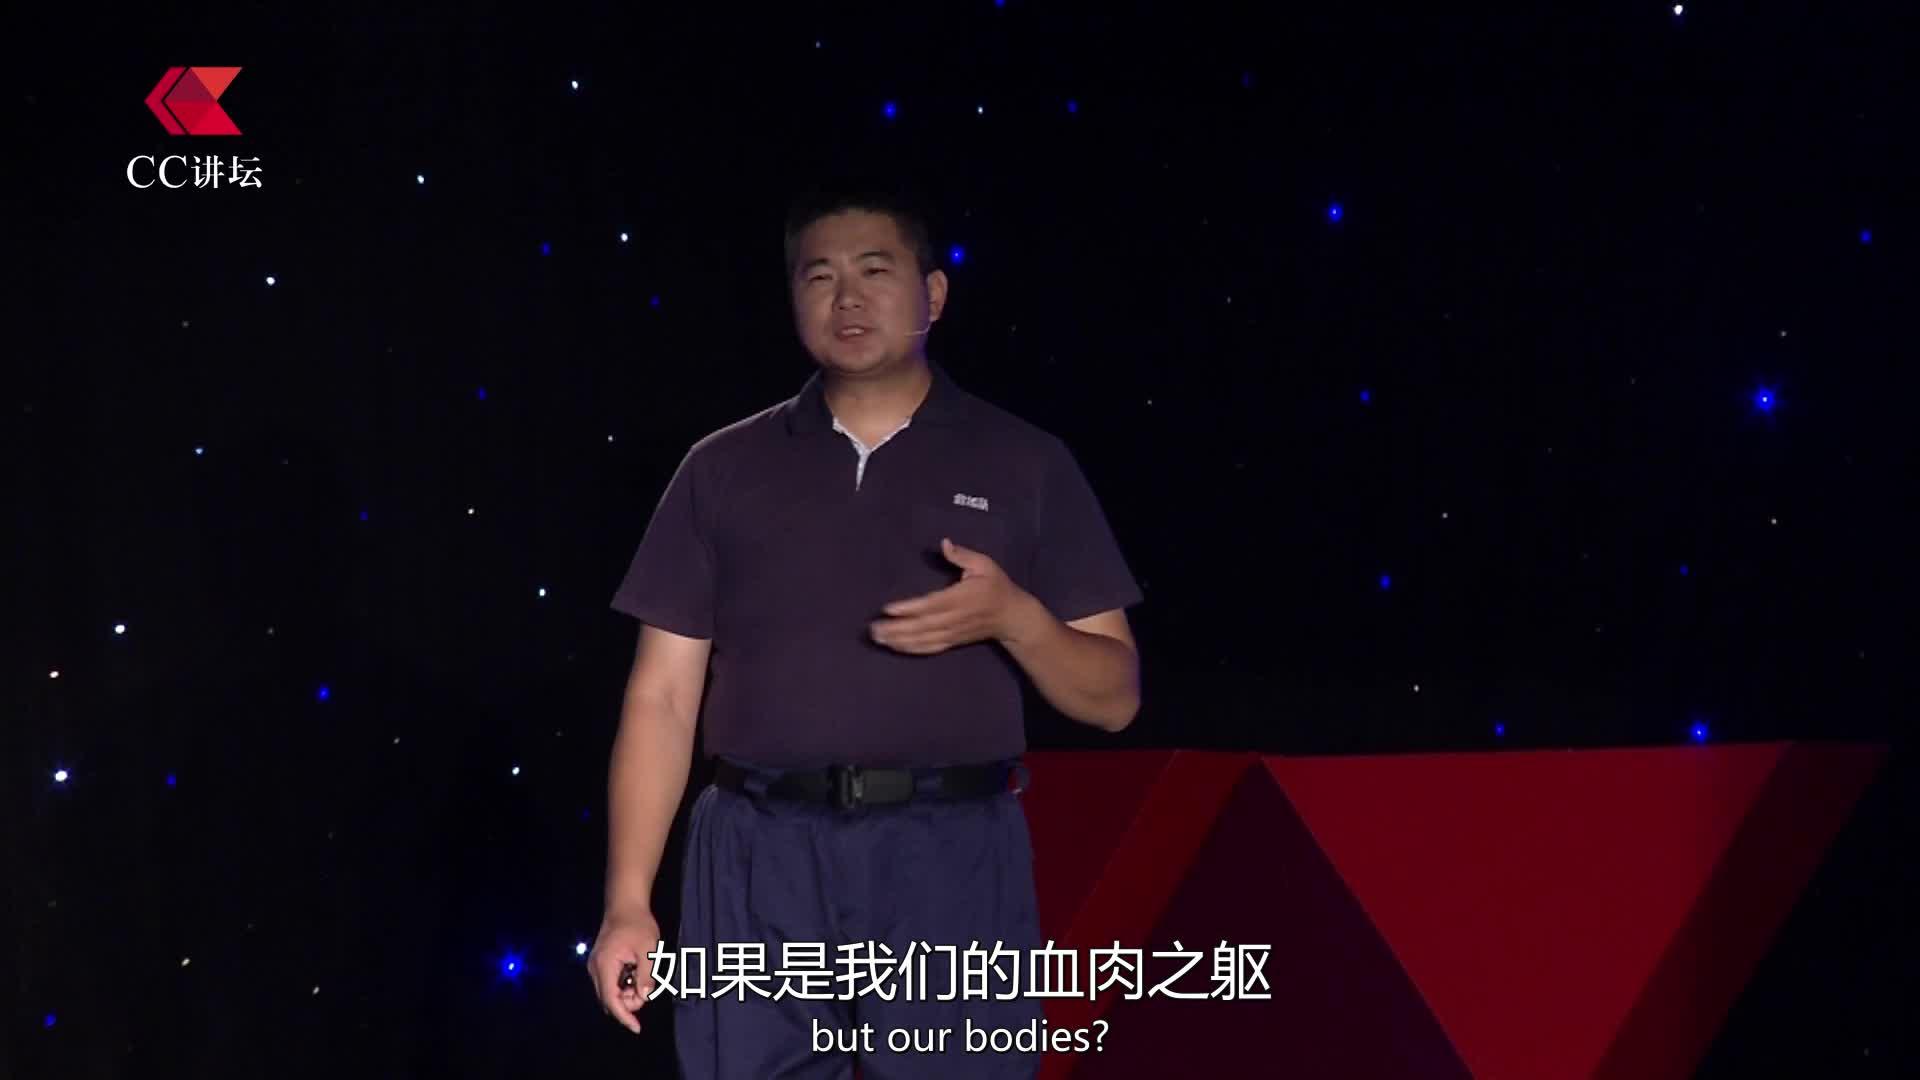 CC讲坛(公益)—杨艳武:灾害来临,你能成为幸存者吗?